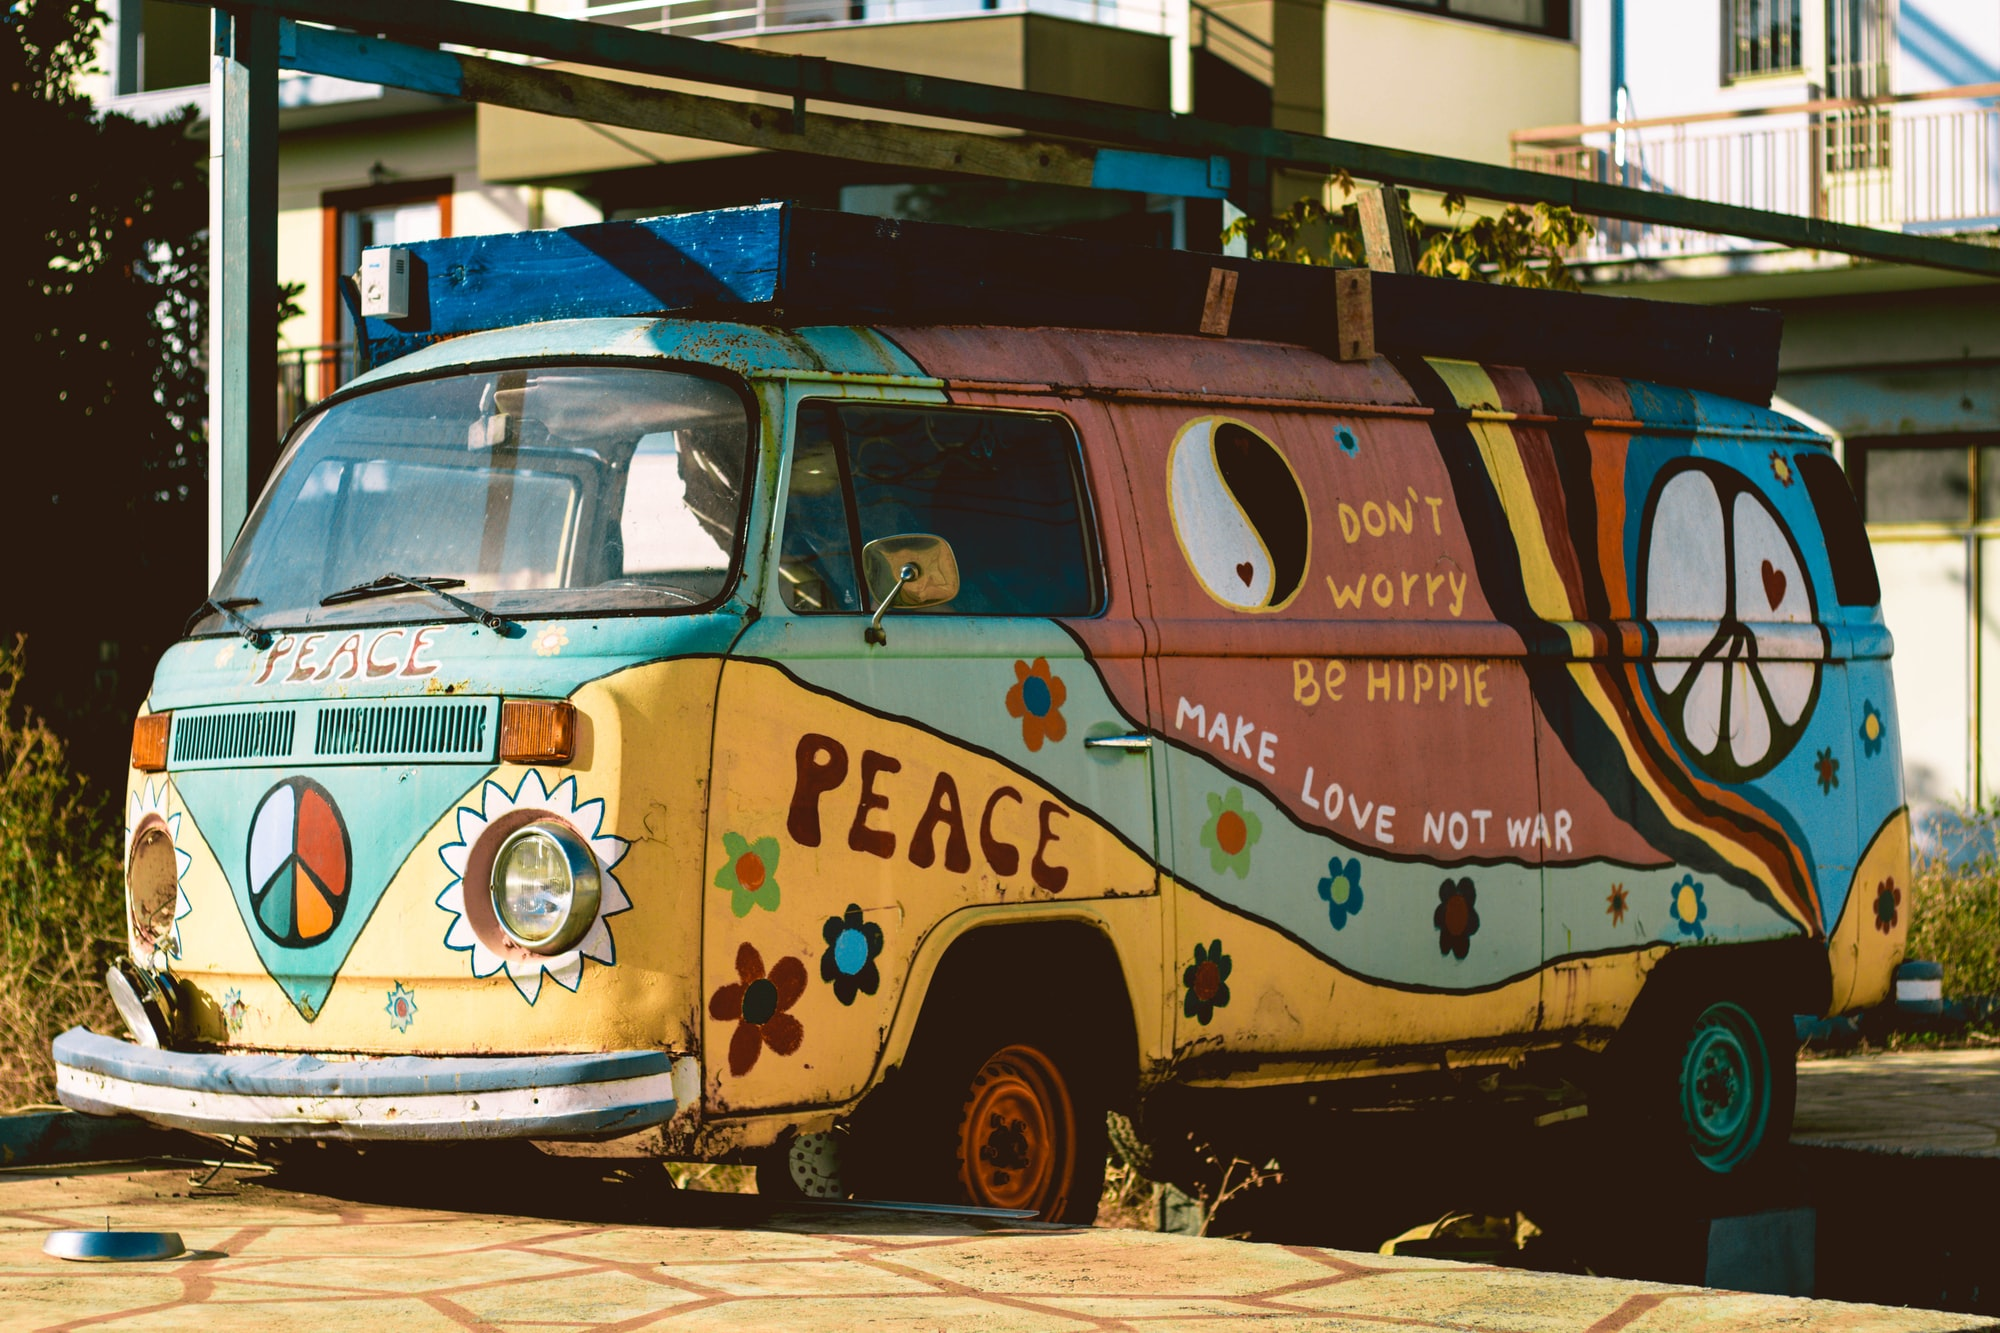 23: Benefits of being a hippie